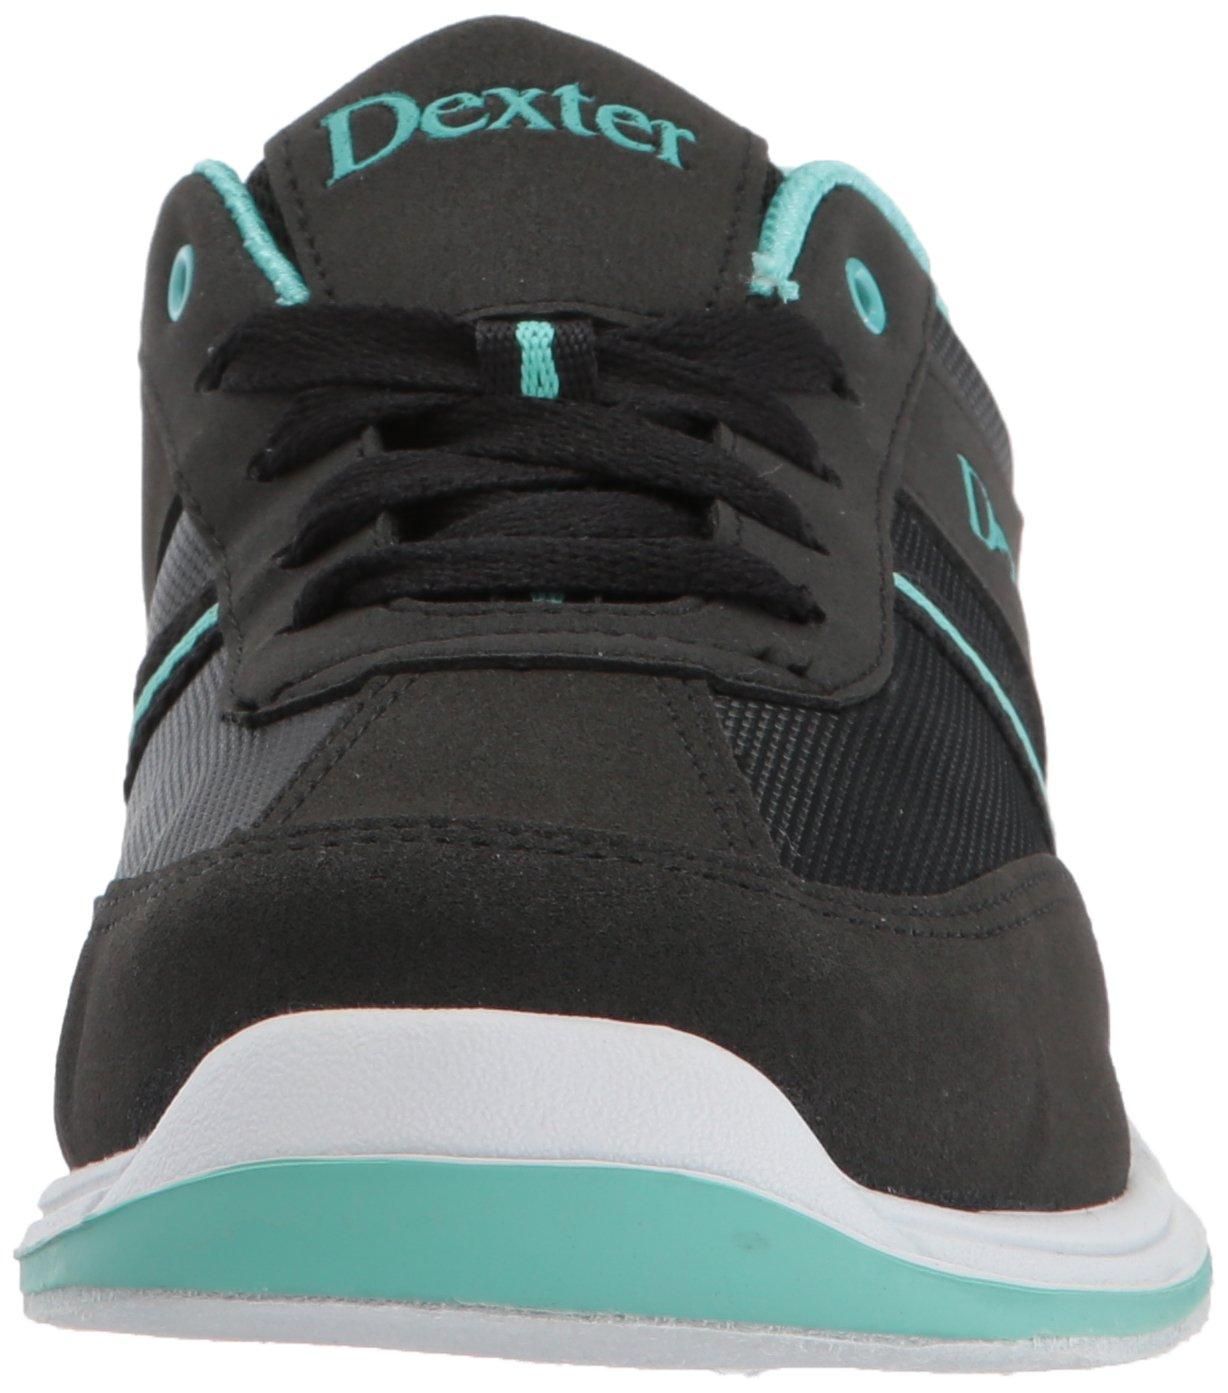 Dexter Dani Bowling Shoes B00ZBWD2ZC 7.5|Black/Turquoise